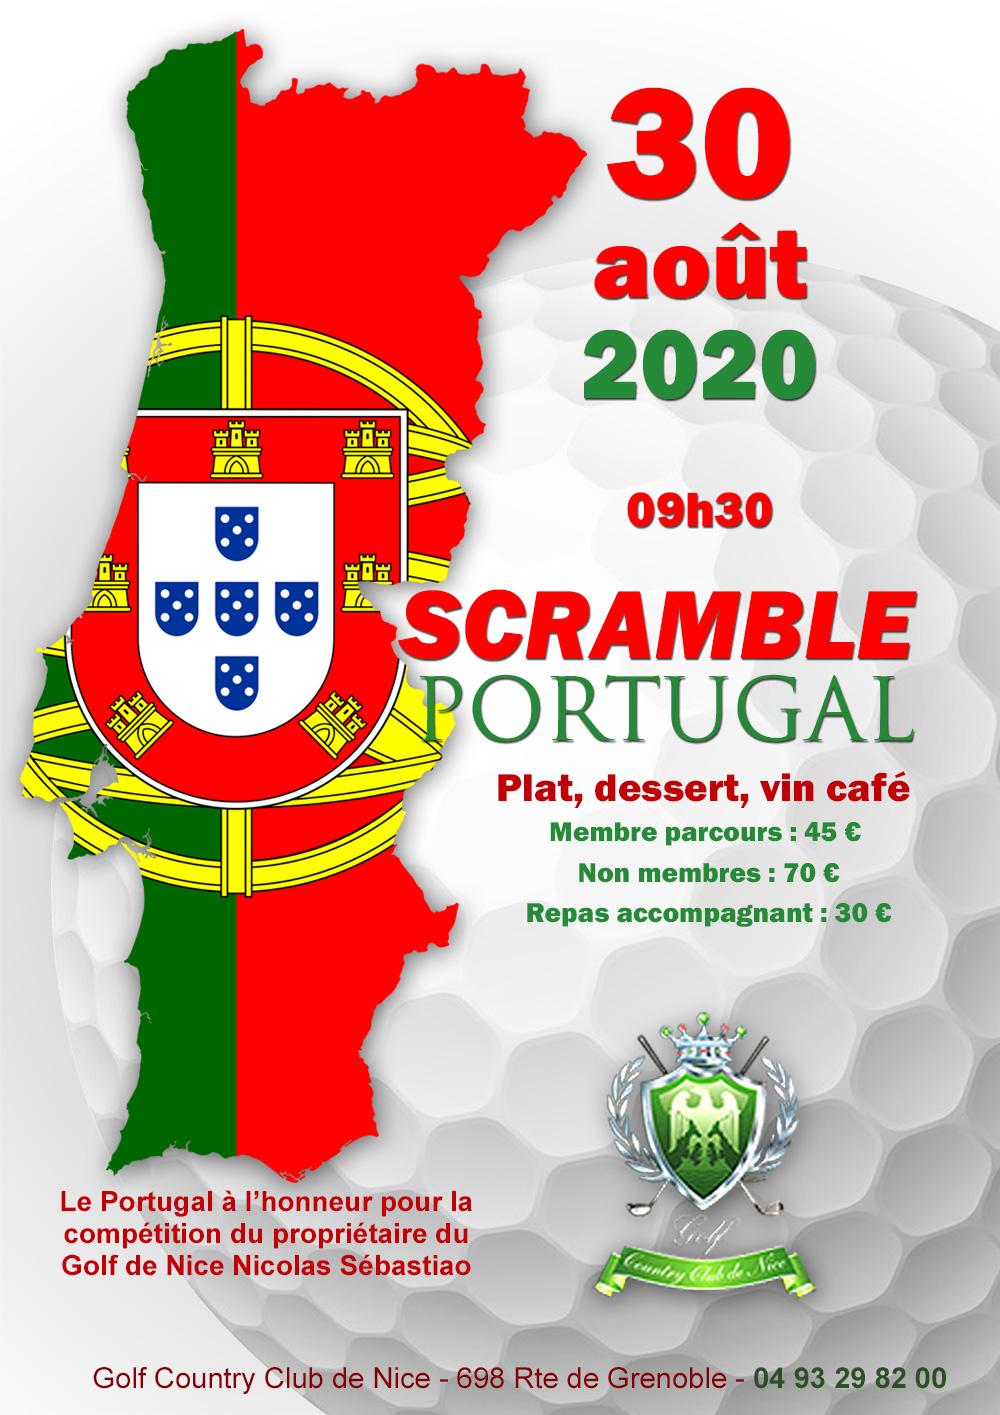 SCRAMBLE PORTUGAL 30aout